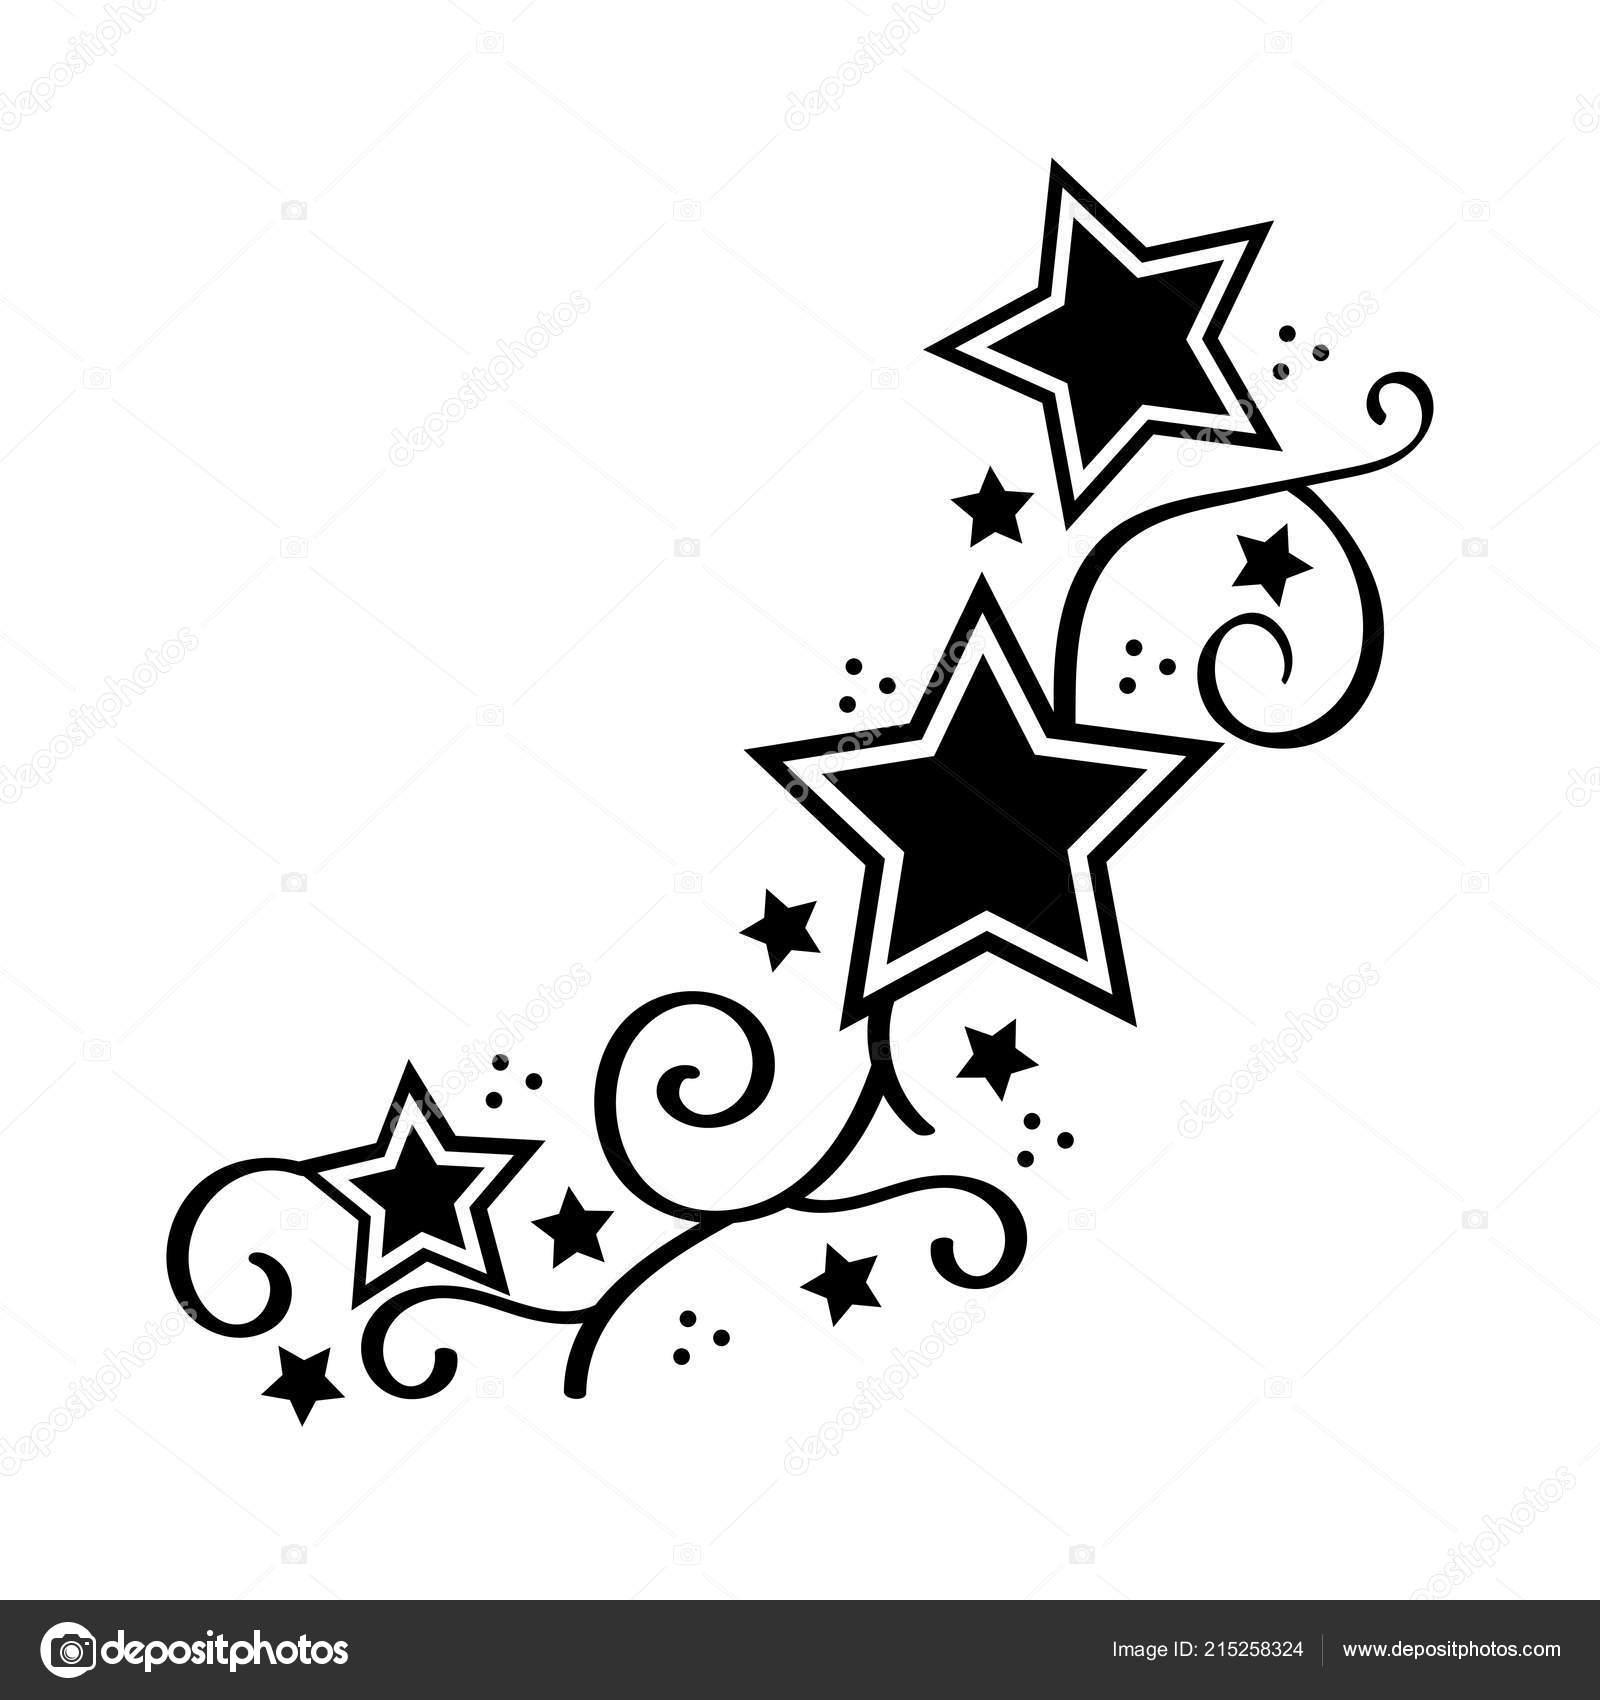 Tattoo Sterren Stencyl Design Klaar Om Af Te Drukken